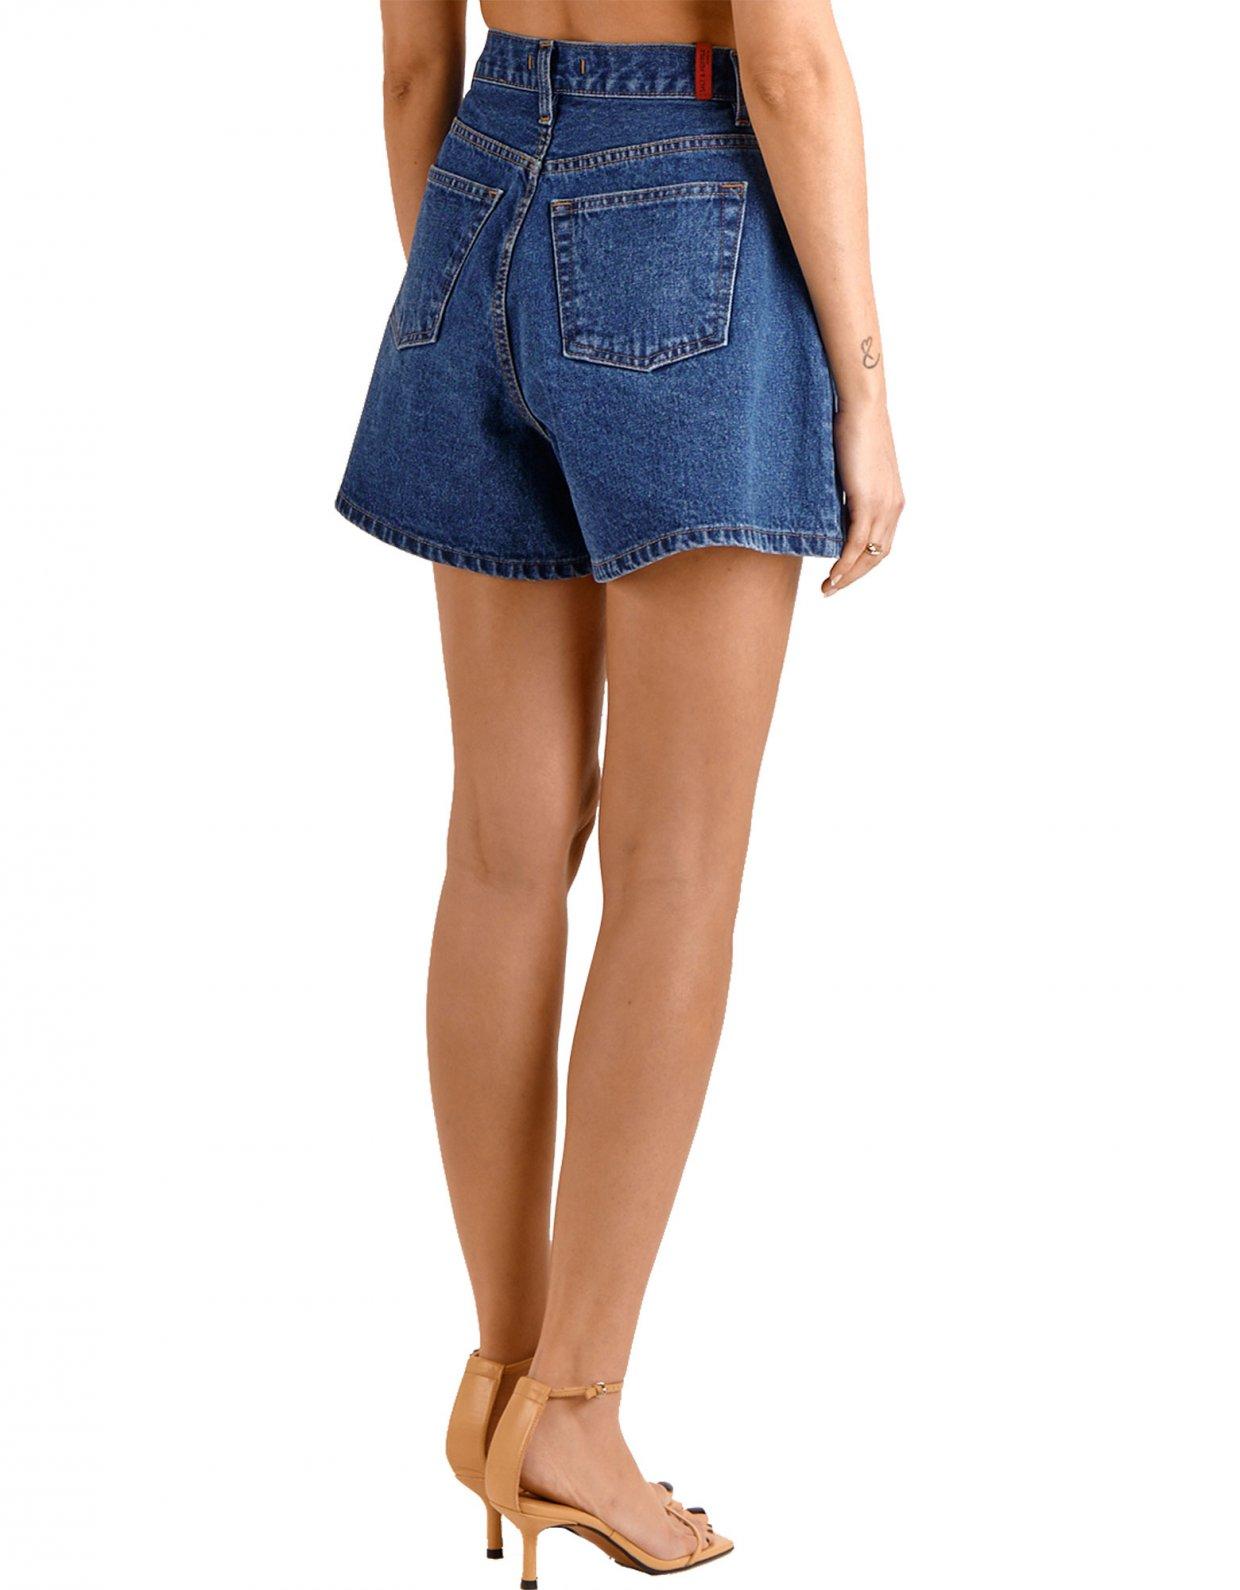 Salt & Pepper Carla S/W denim shorts